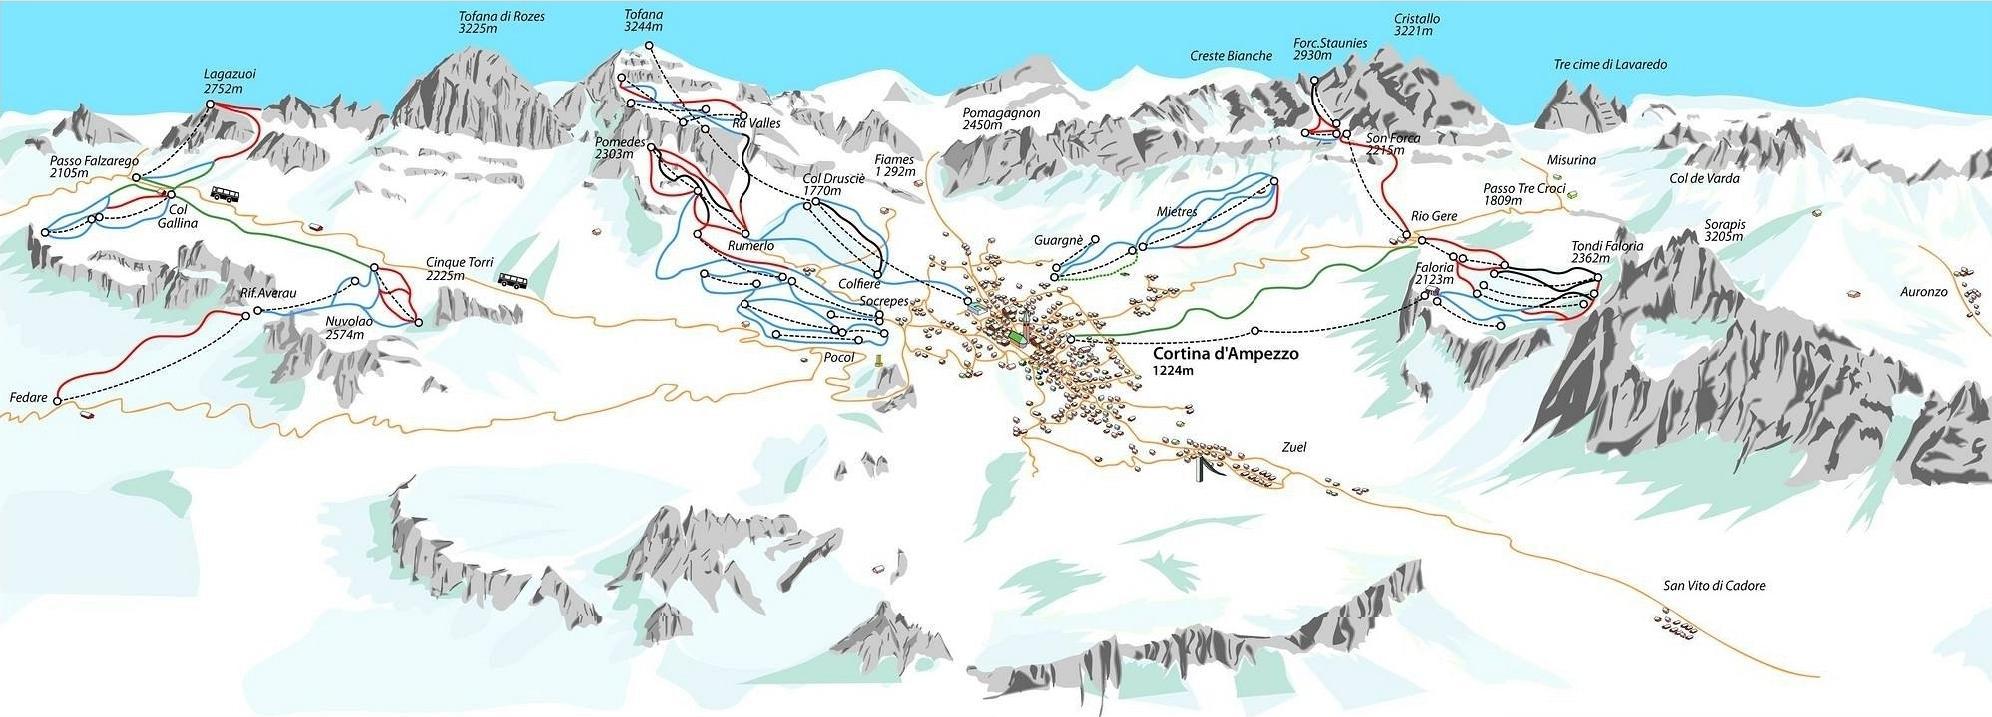 Unique Reasons you should choose Cortina ski holiday Destination